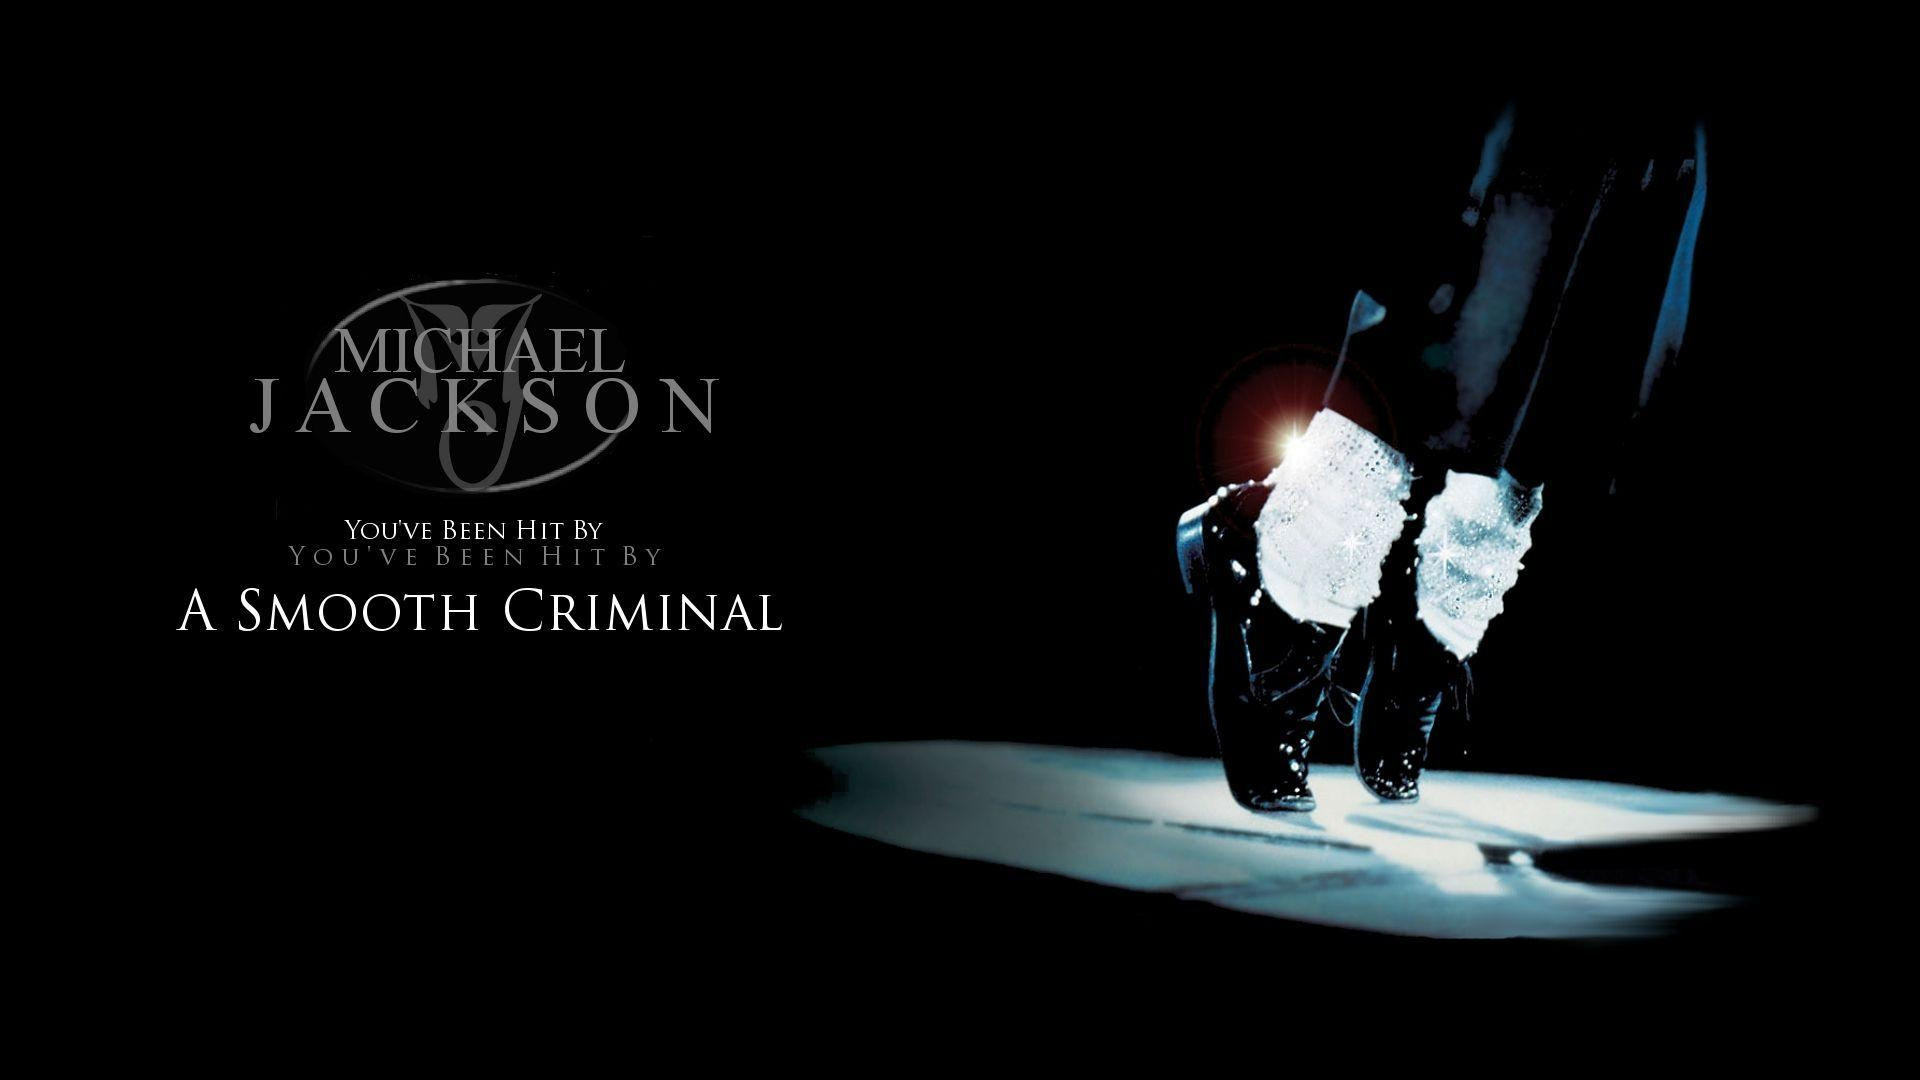 Hd Michael Jackson Smooth Criminal Wallpaper Download Free